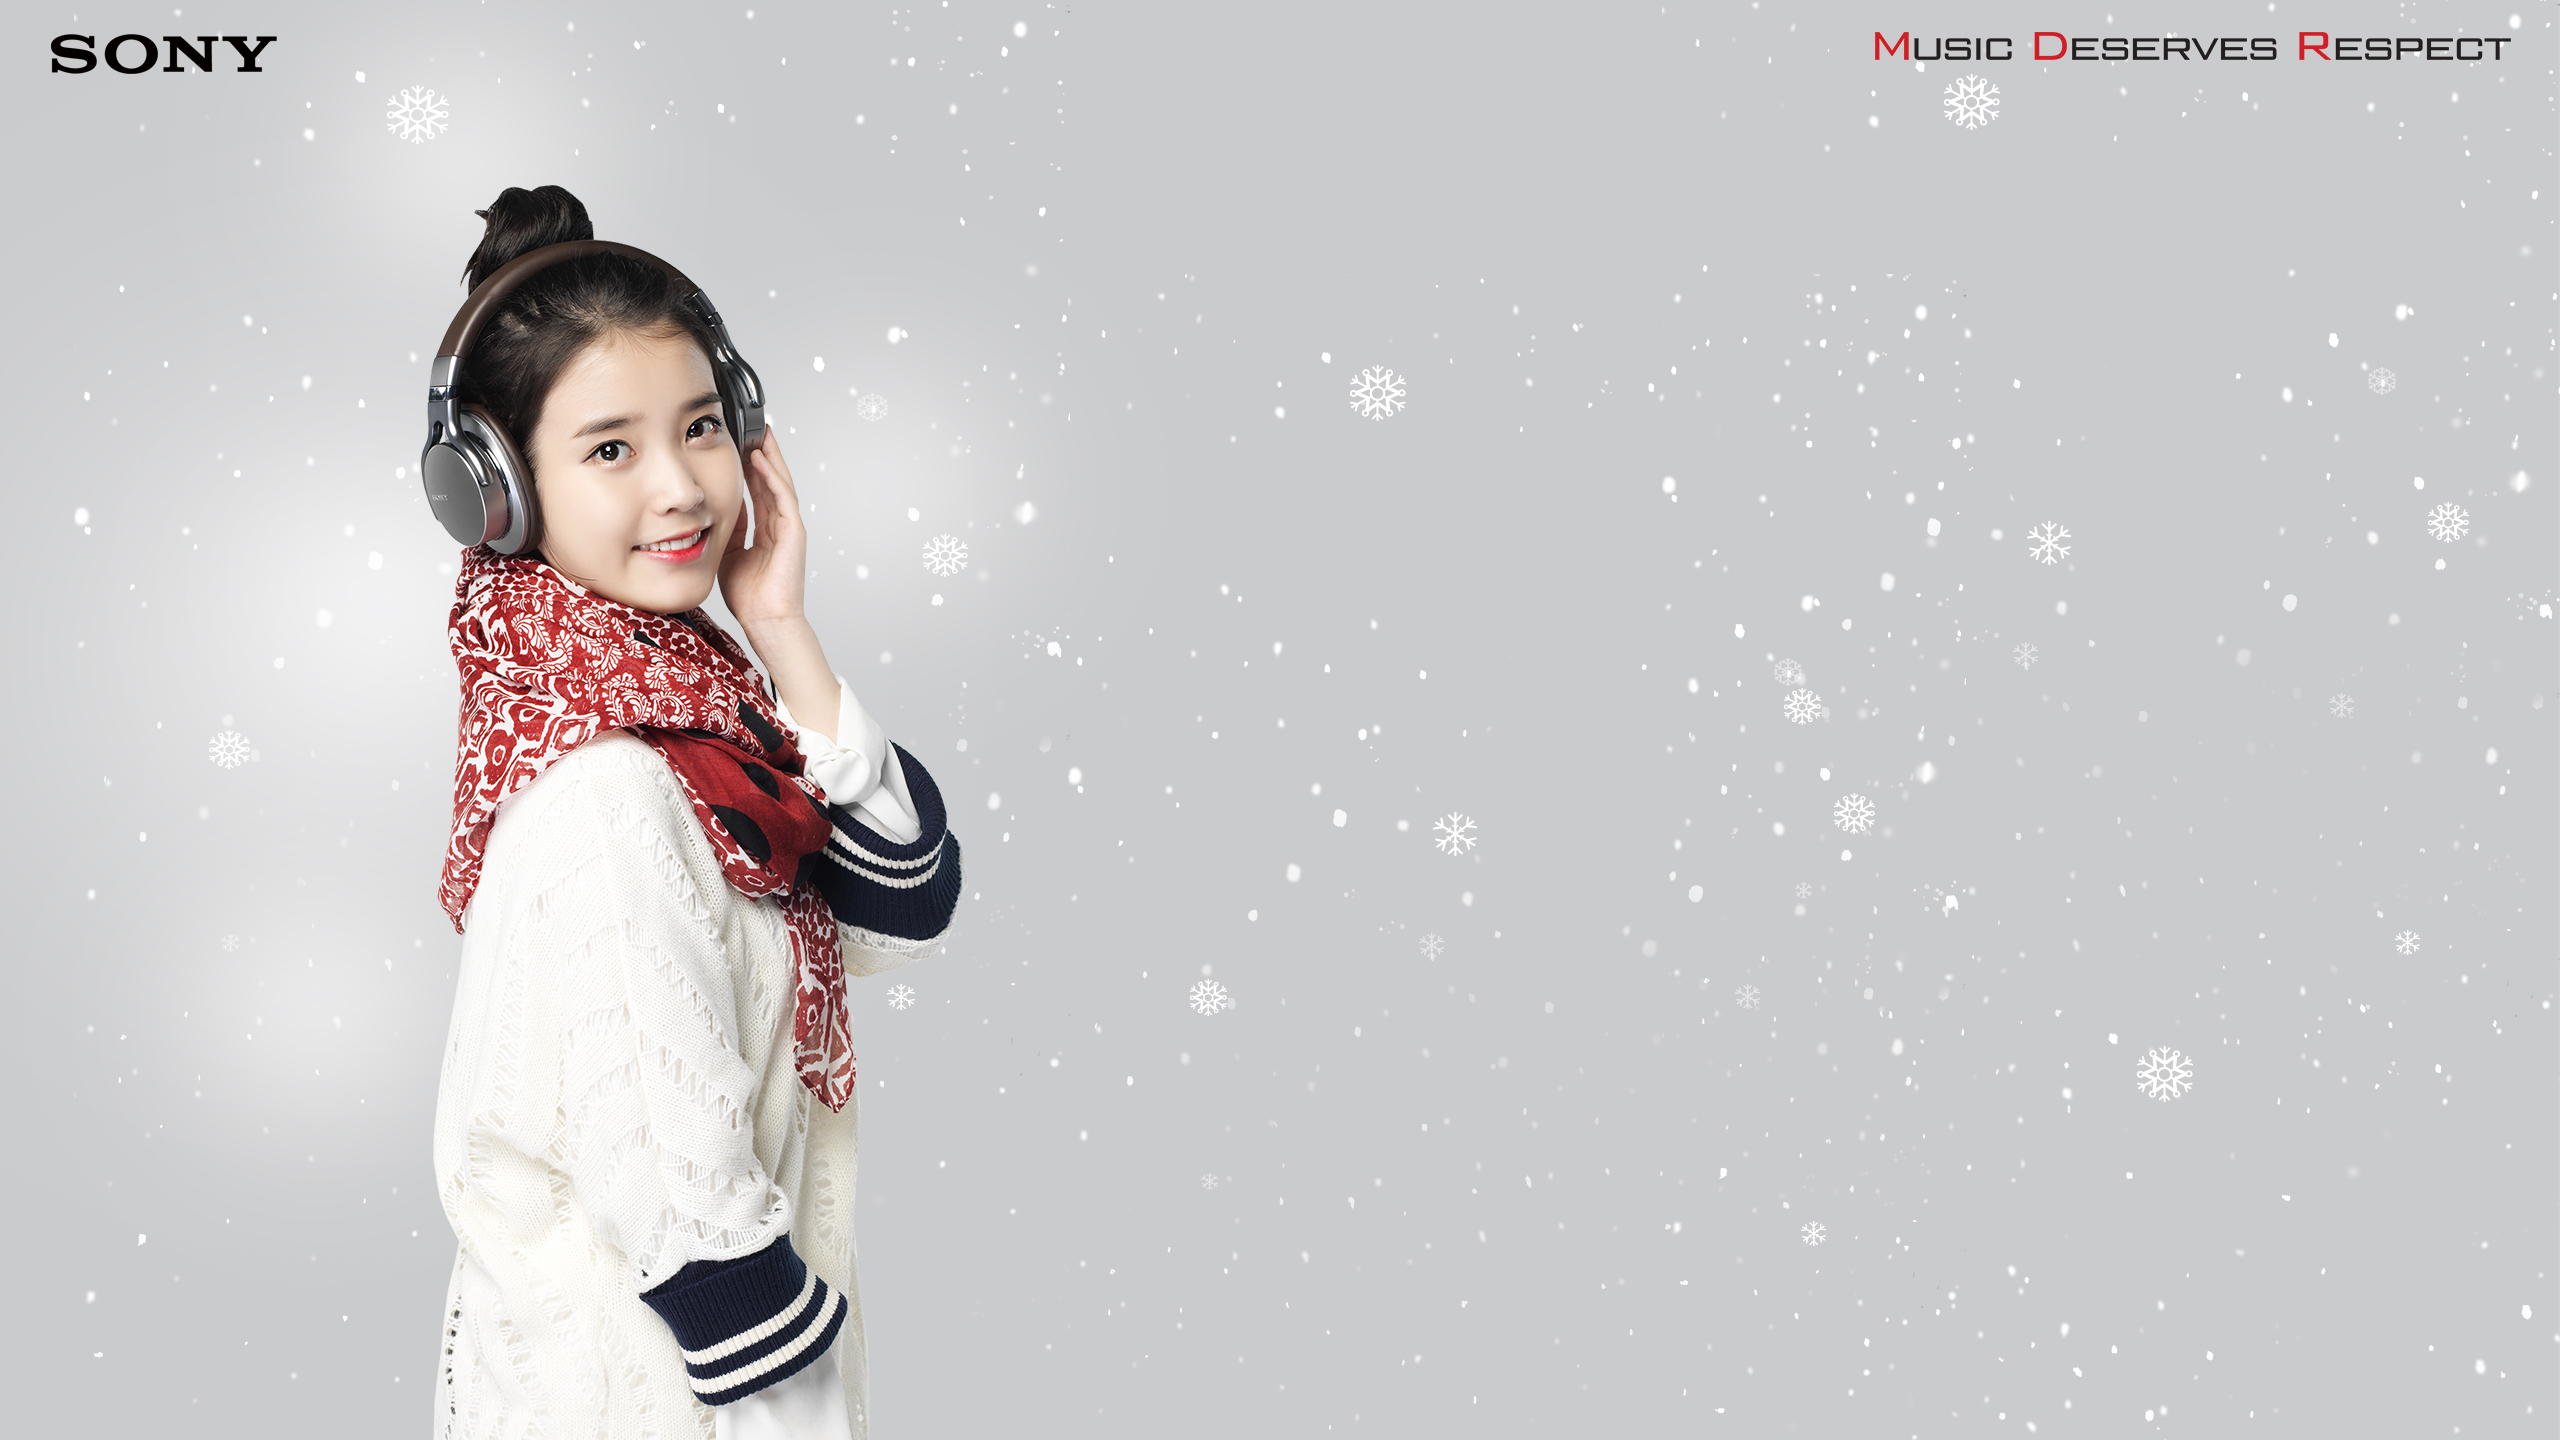 Iu Hd Wallpaper Asiachan Kpop Jpop Image Board